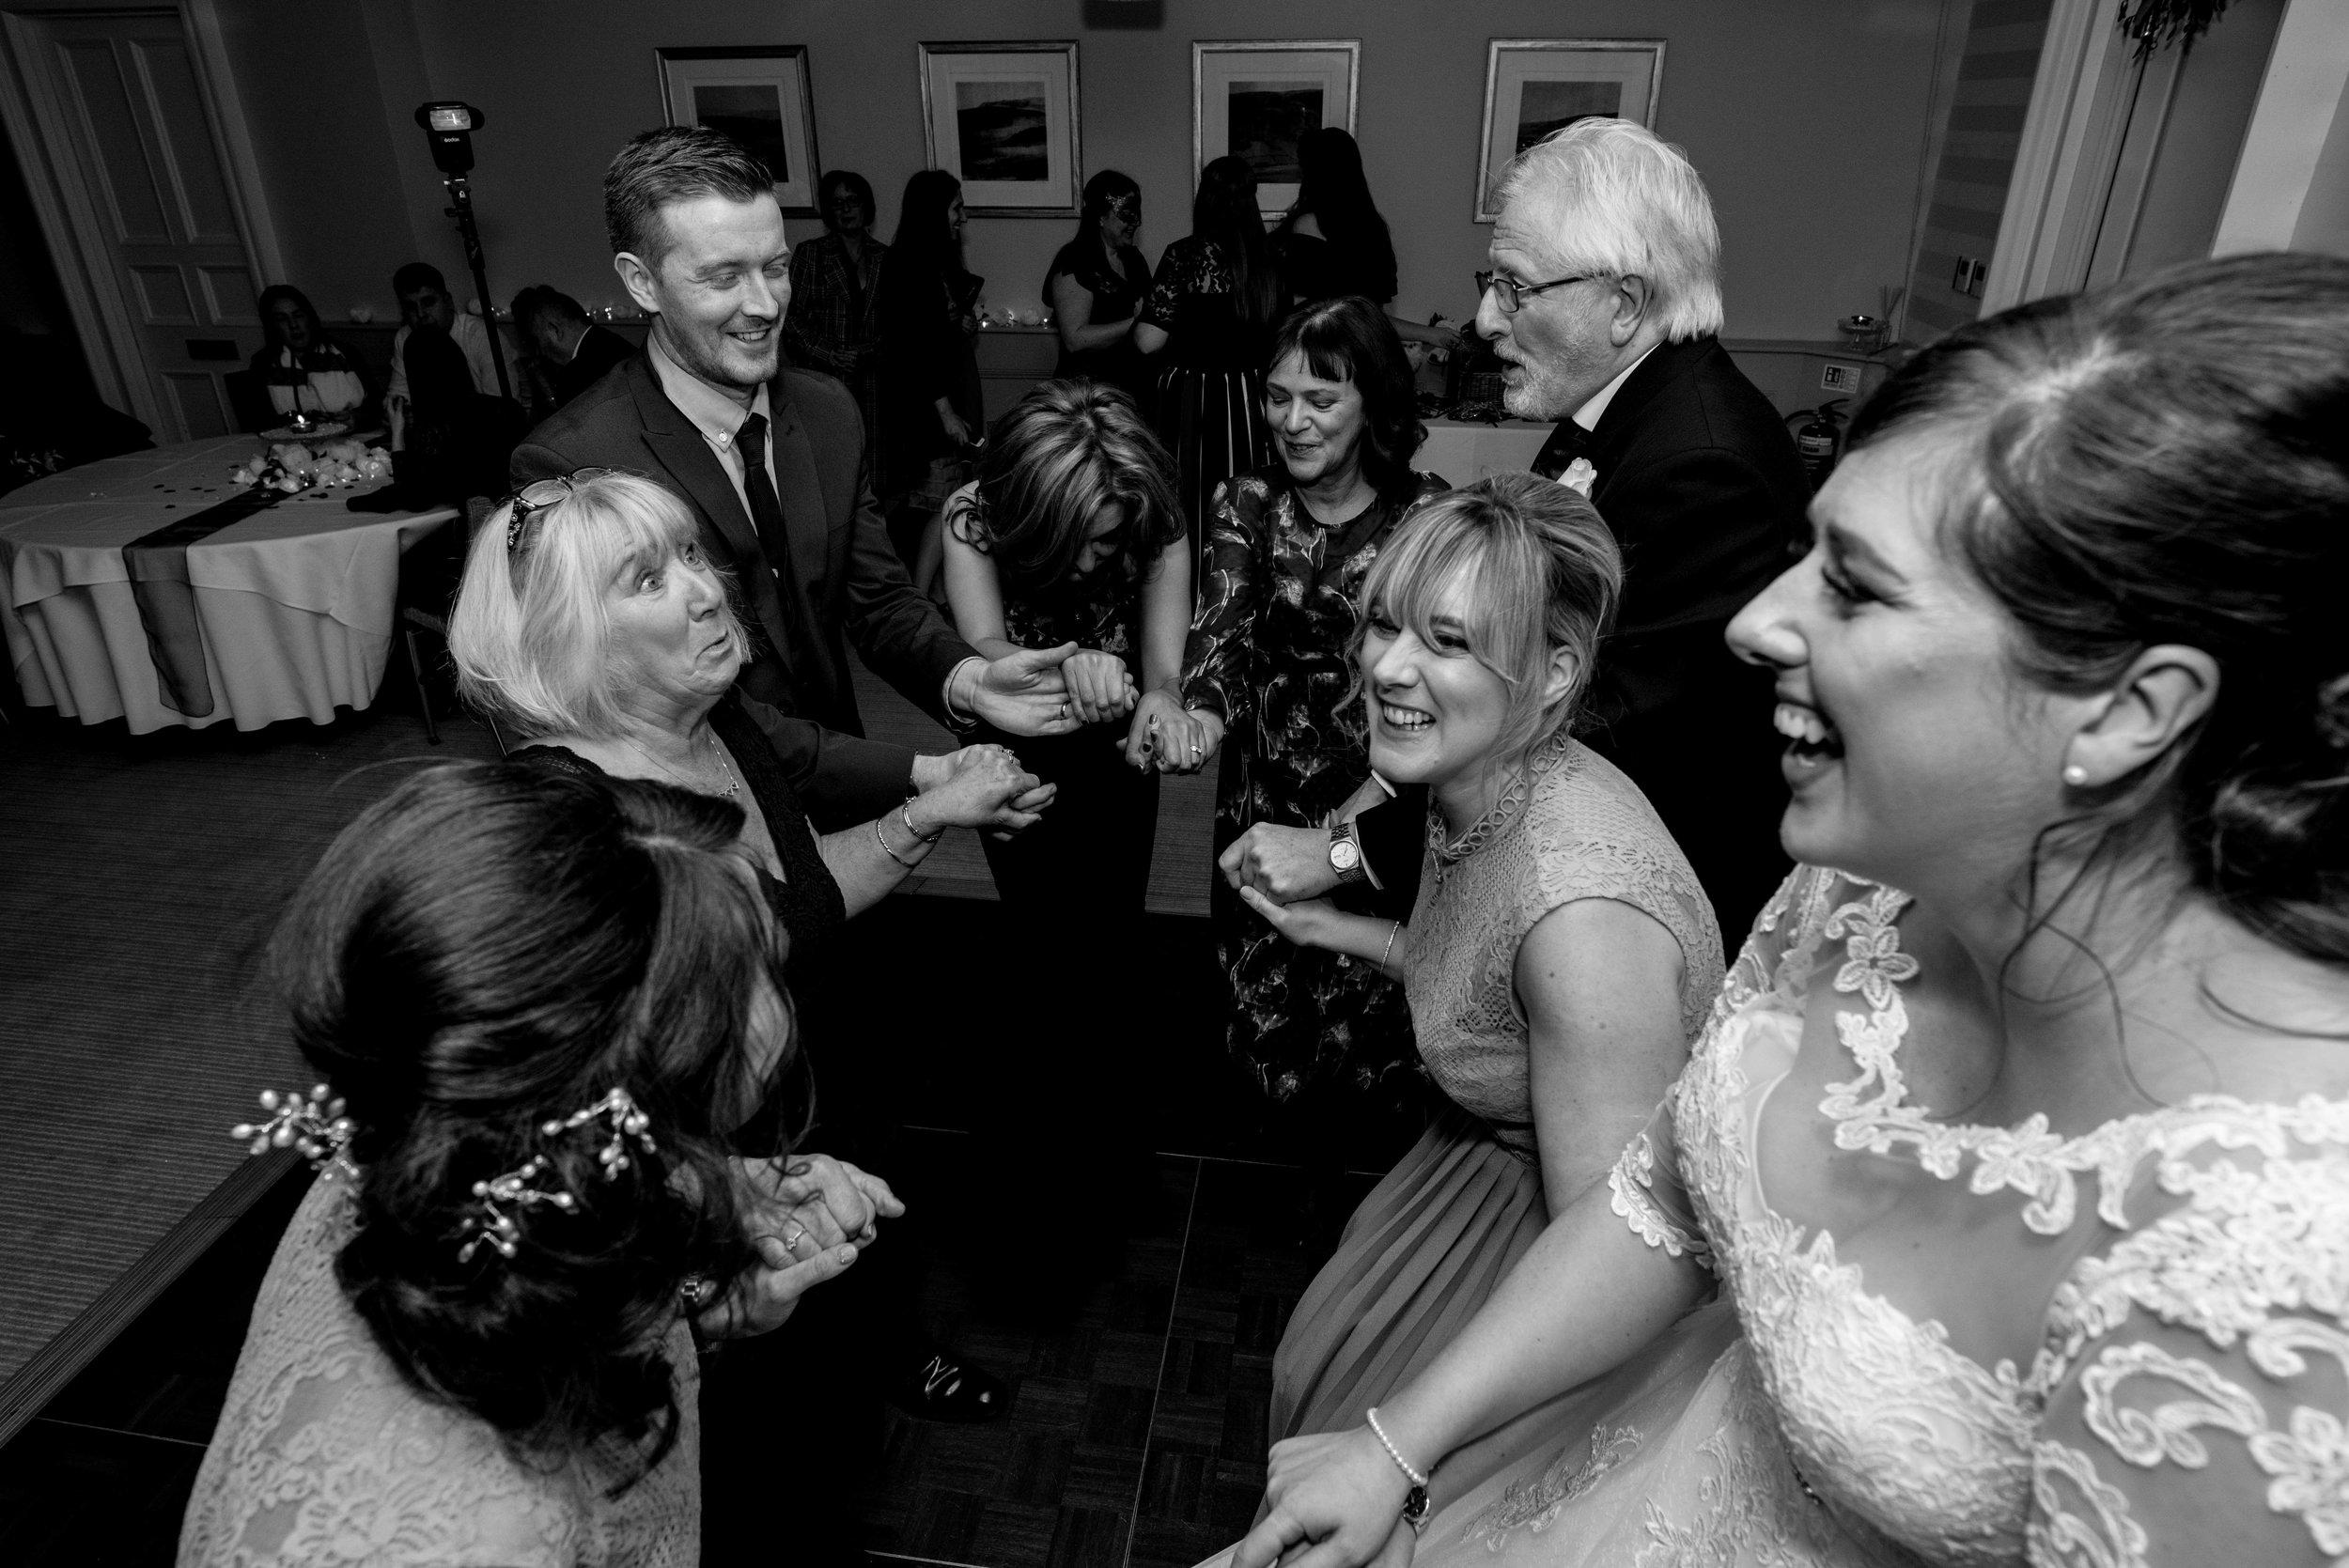 Belsfield-wedding-photography-57.jpg